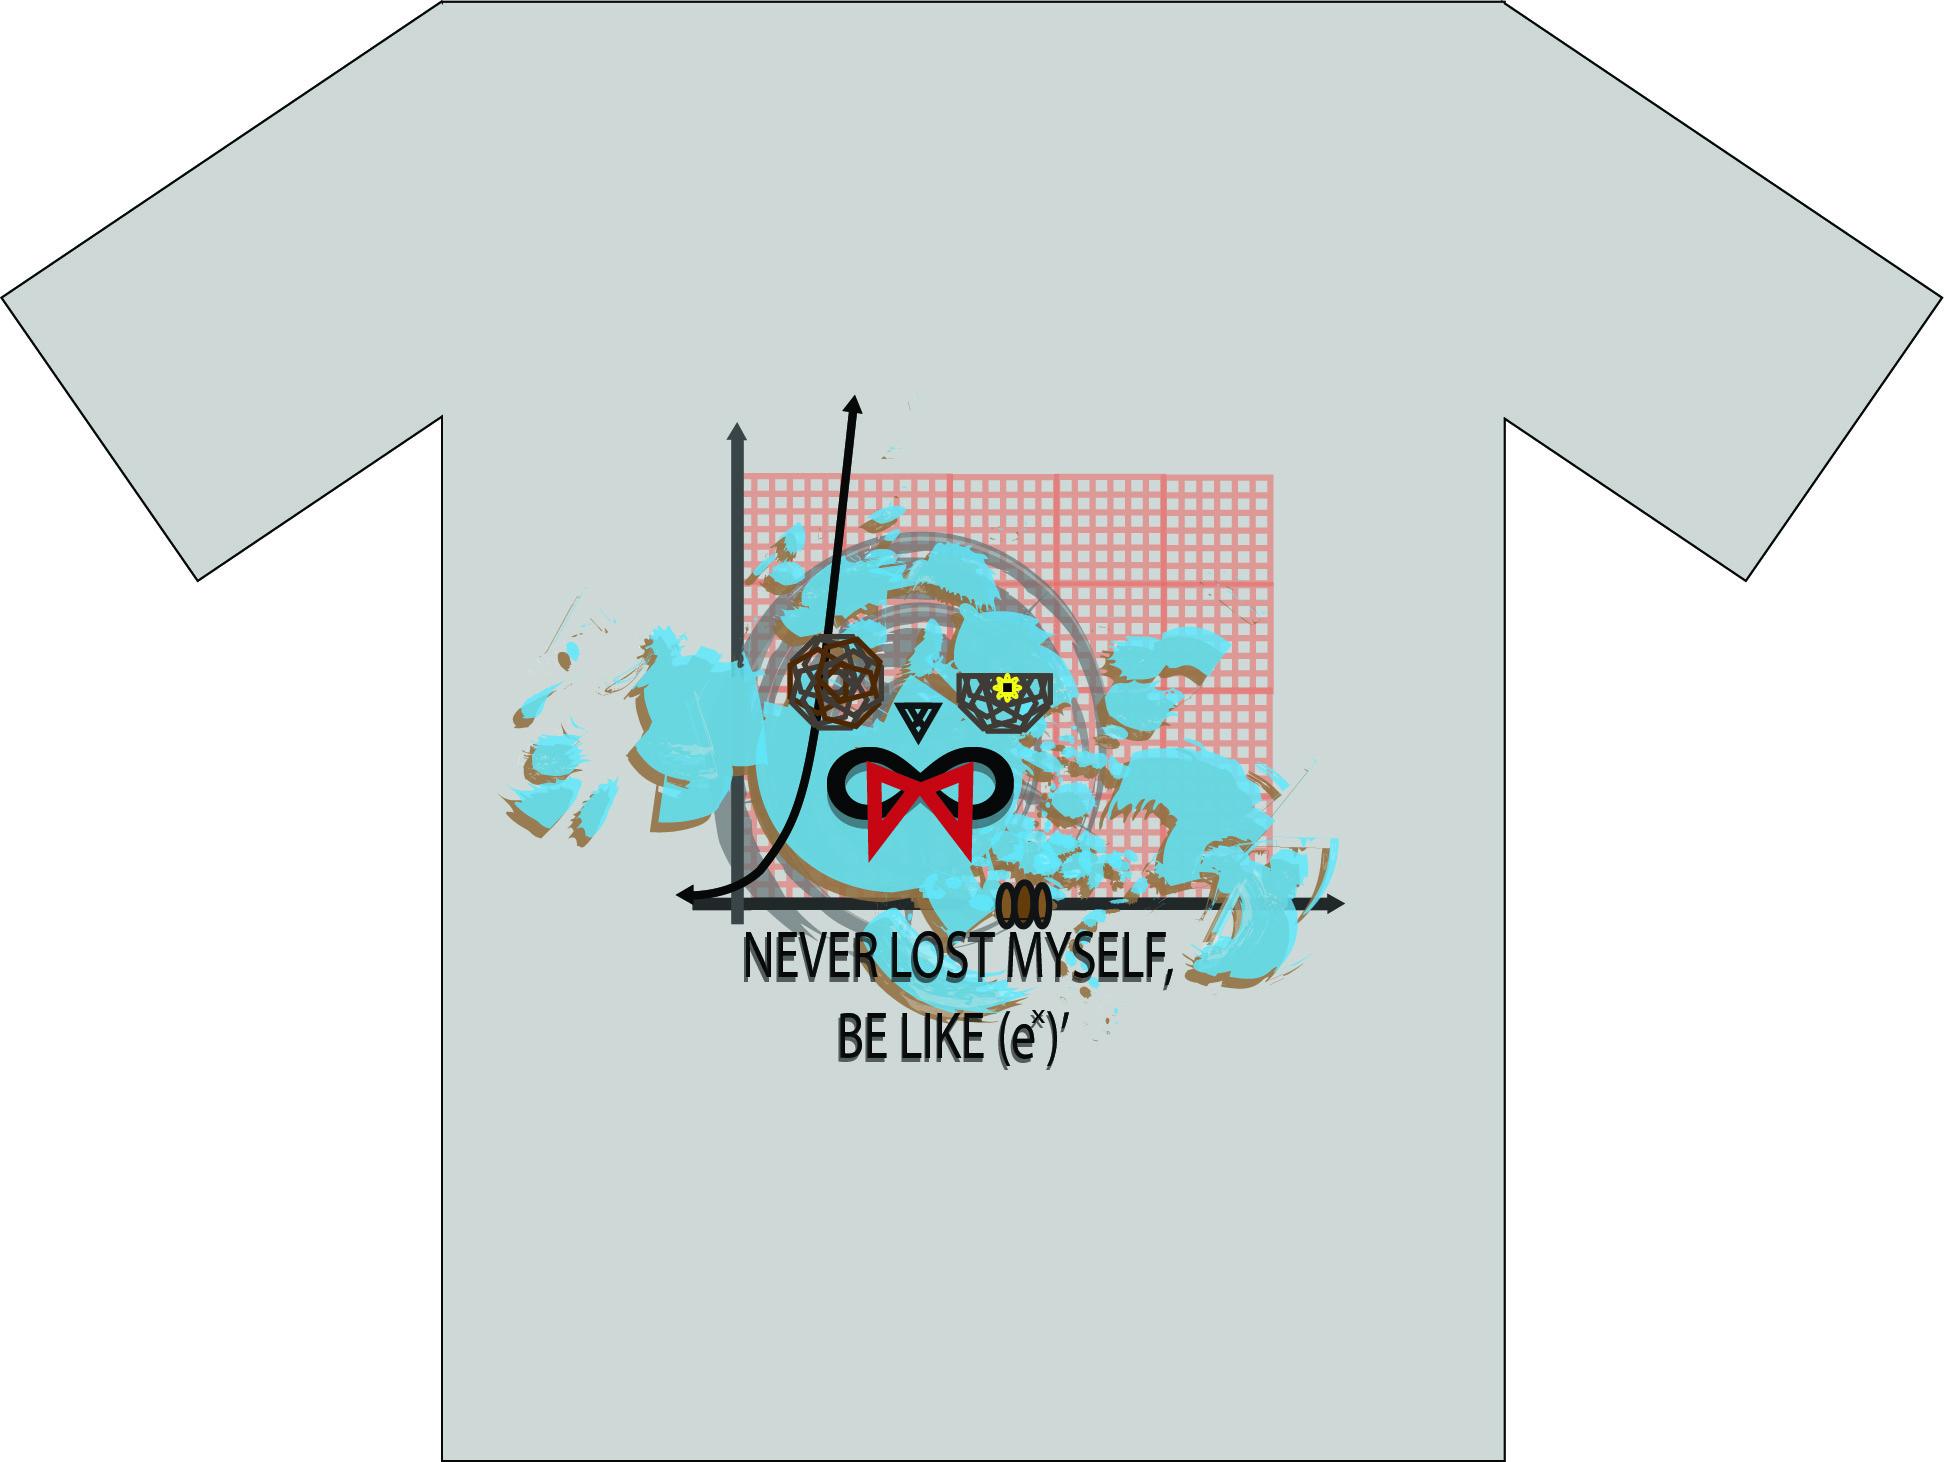 94a4d883a Canada Math T-shirt Designs 2015